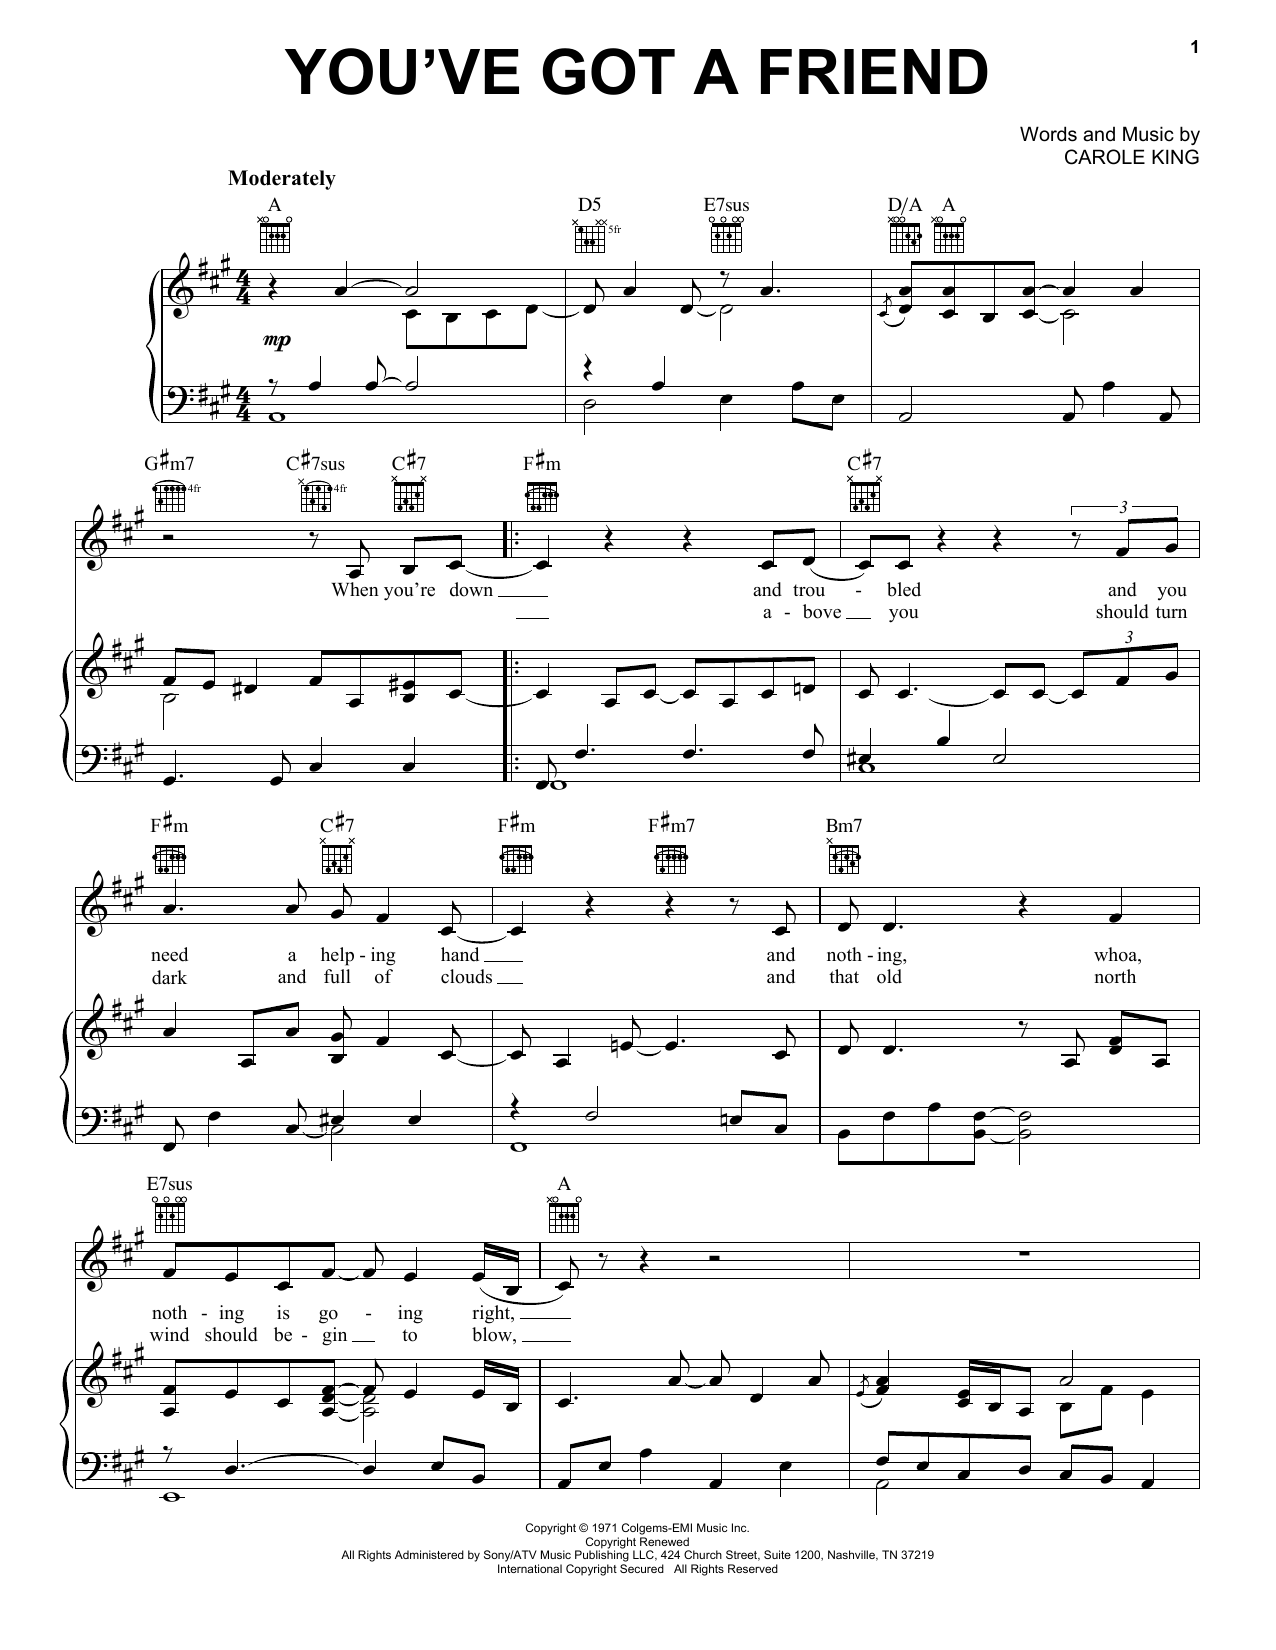 Carole King 'You've Got A Friend' Sheet Music Notes, Chords   Download  Printable Lyrics & Chords   SKU 15